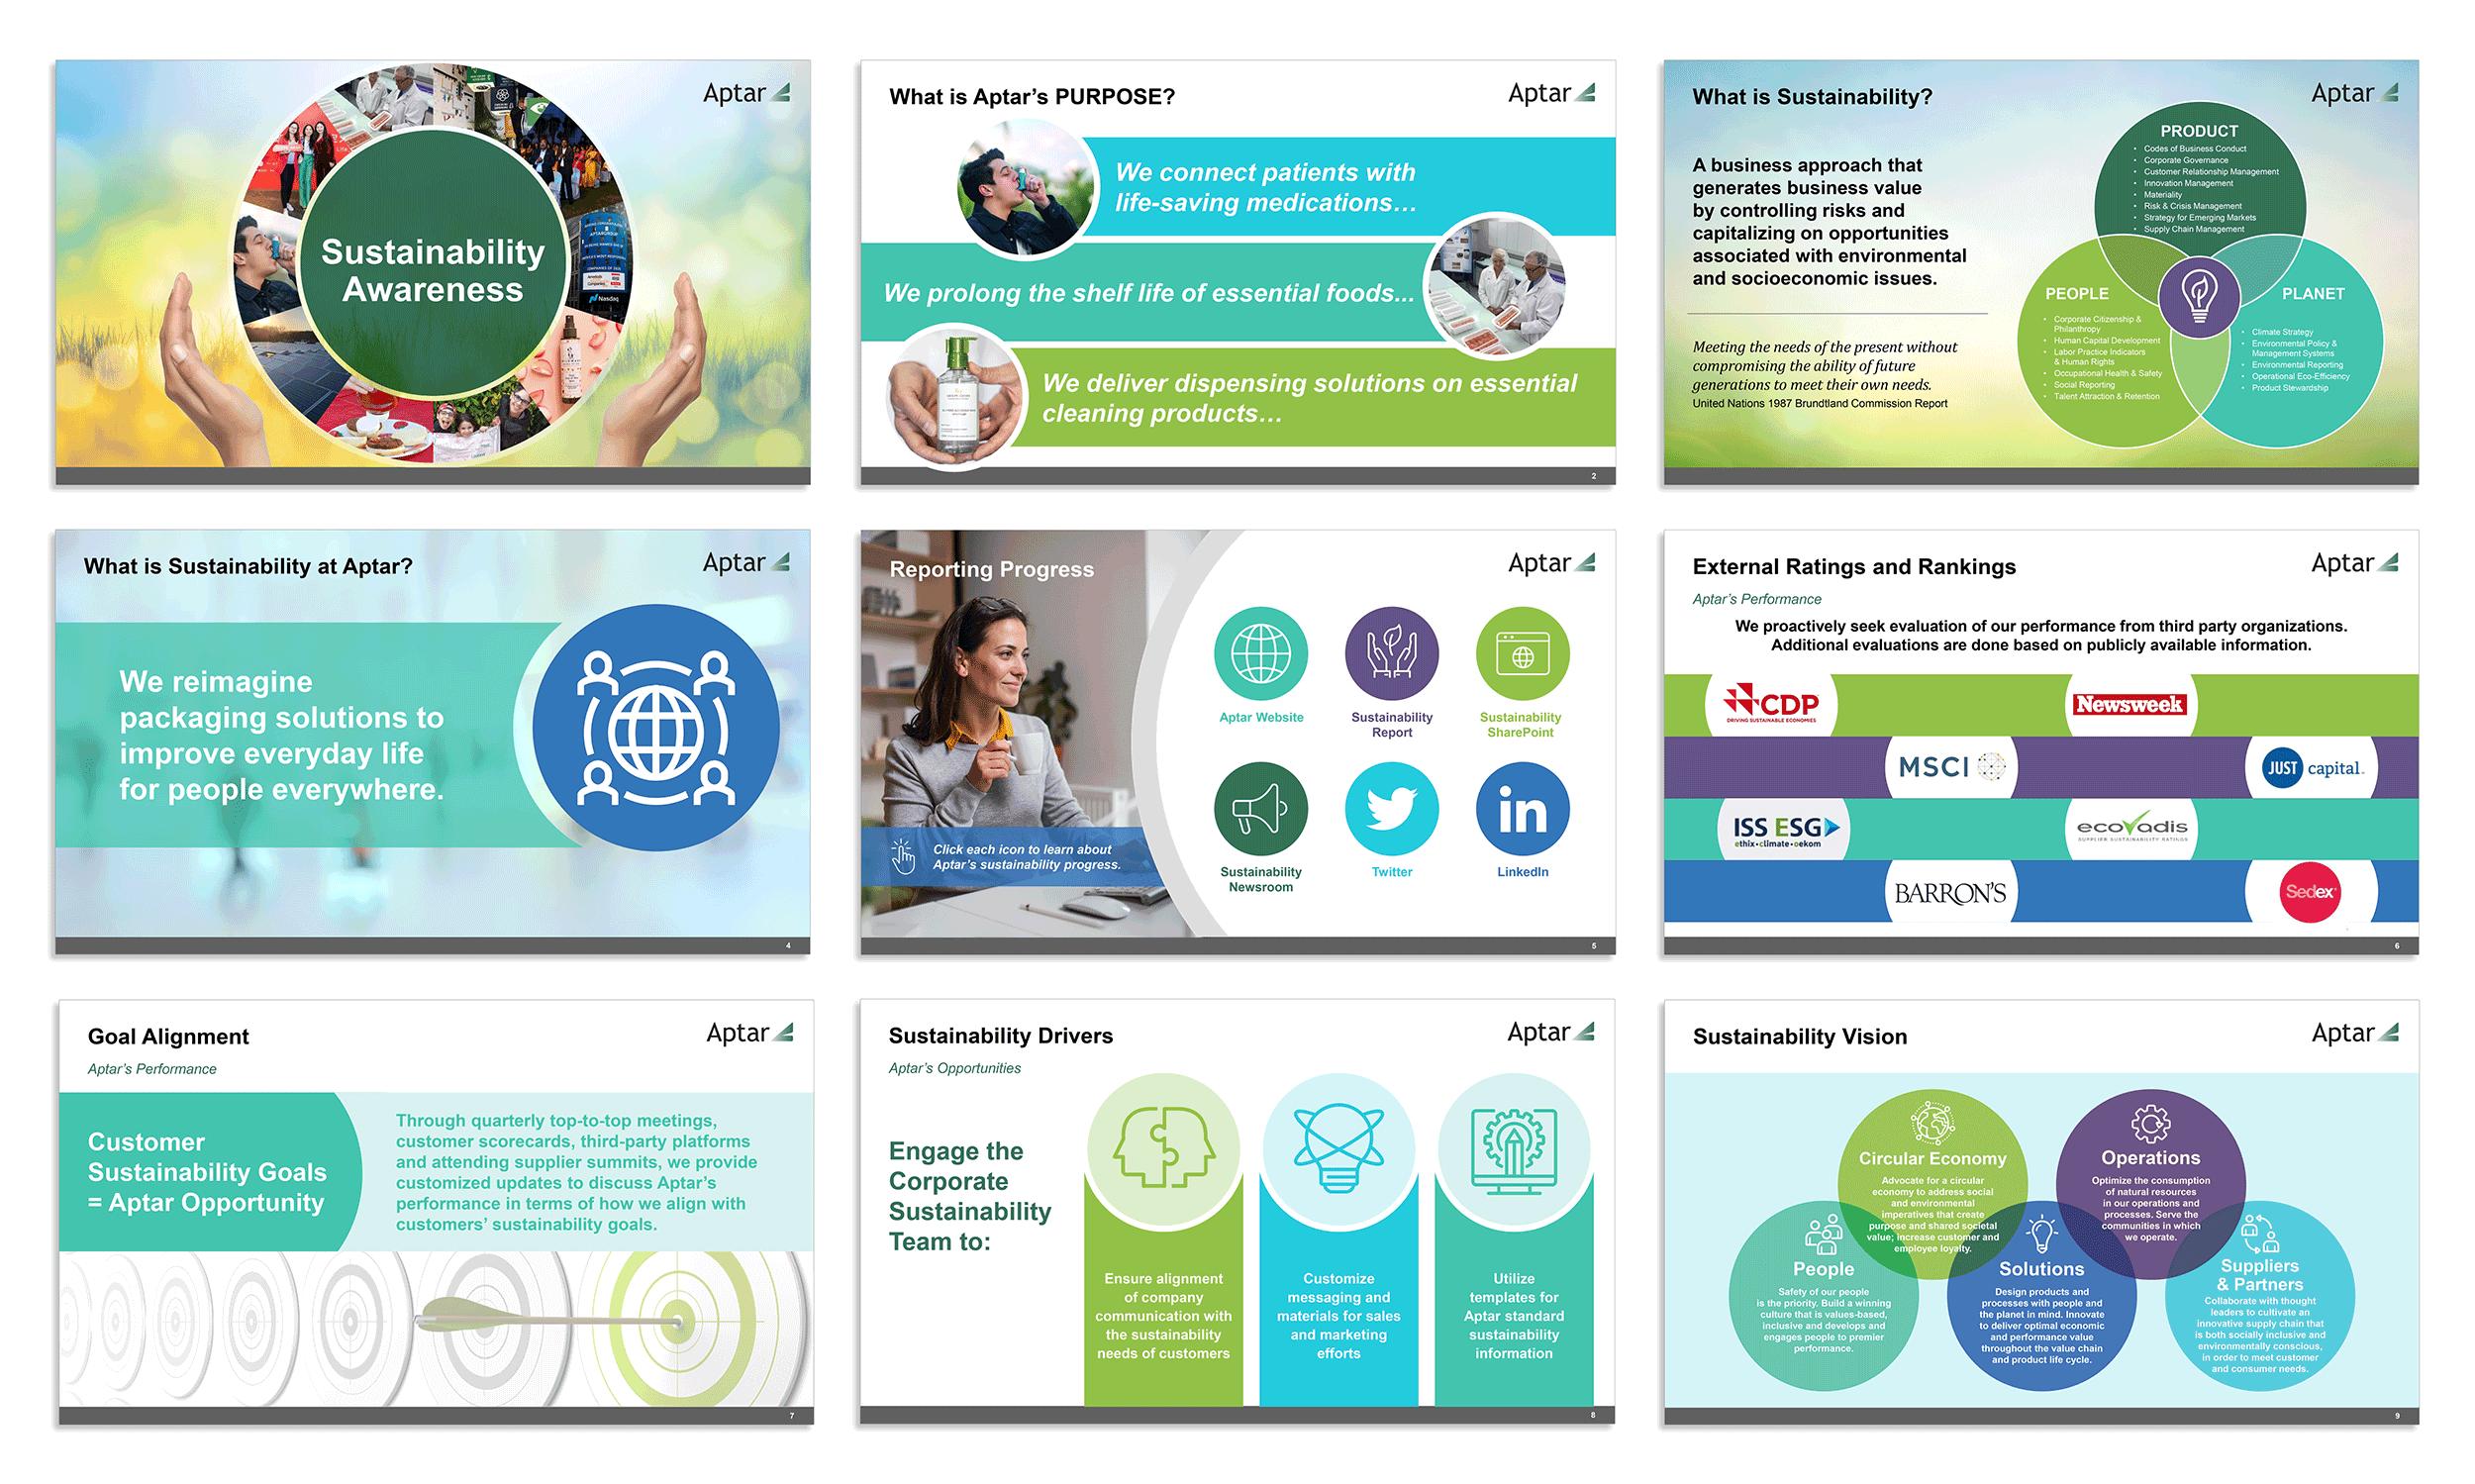 Slideshow presentation design by Virtual Apiary for Aptar